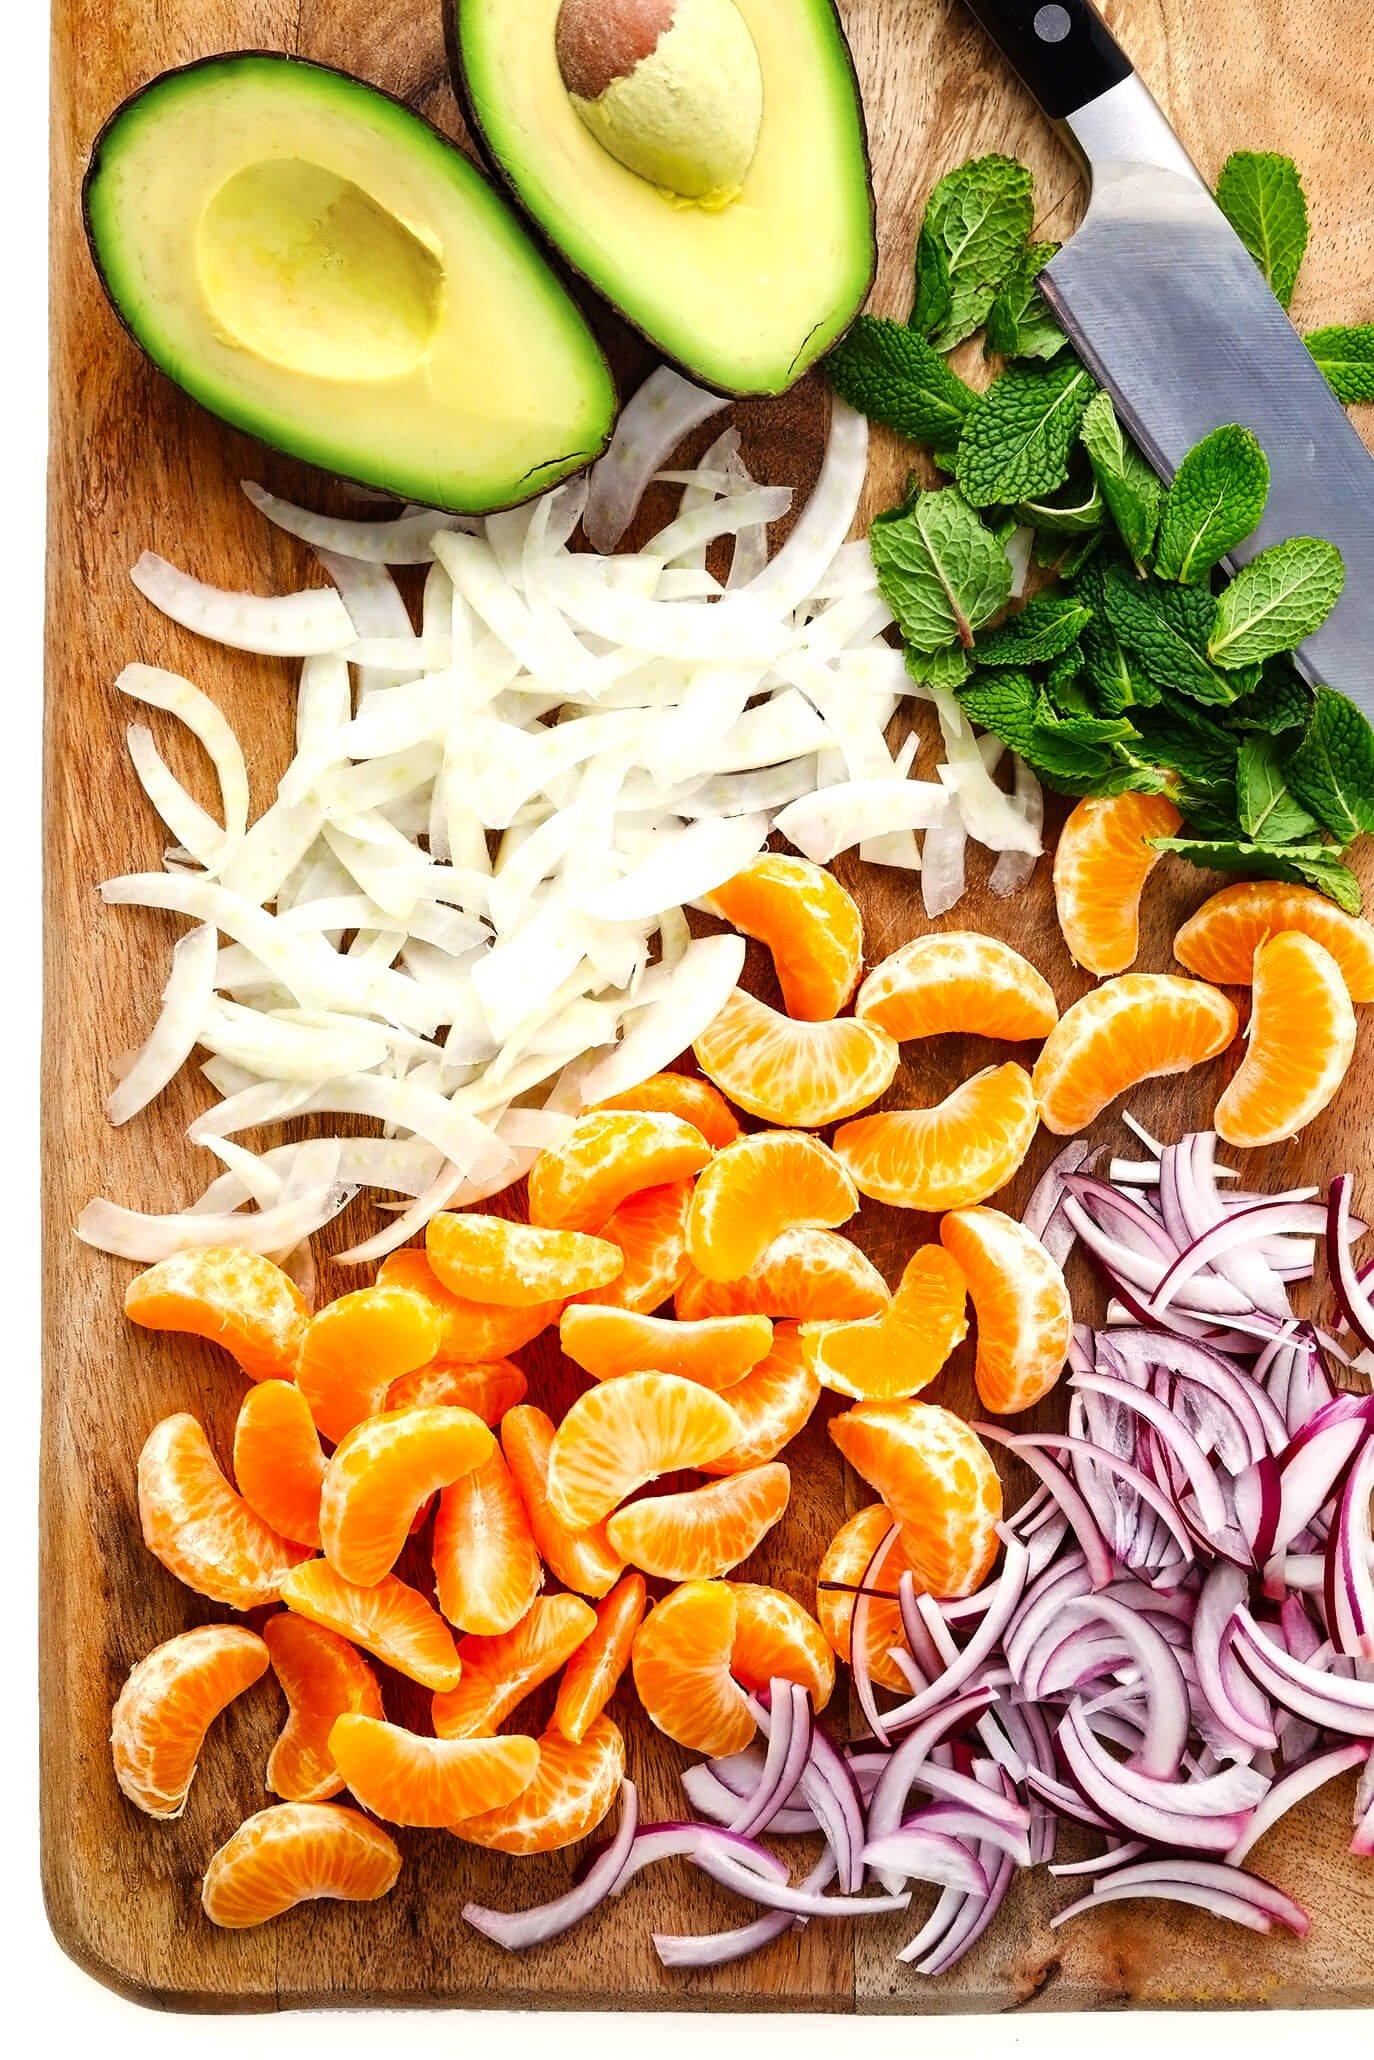 Tábua de cortar com abacate fresco, erva-doce, cebola roxa, hortelã e laranjas clementina